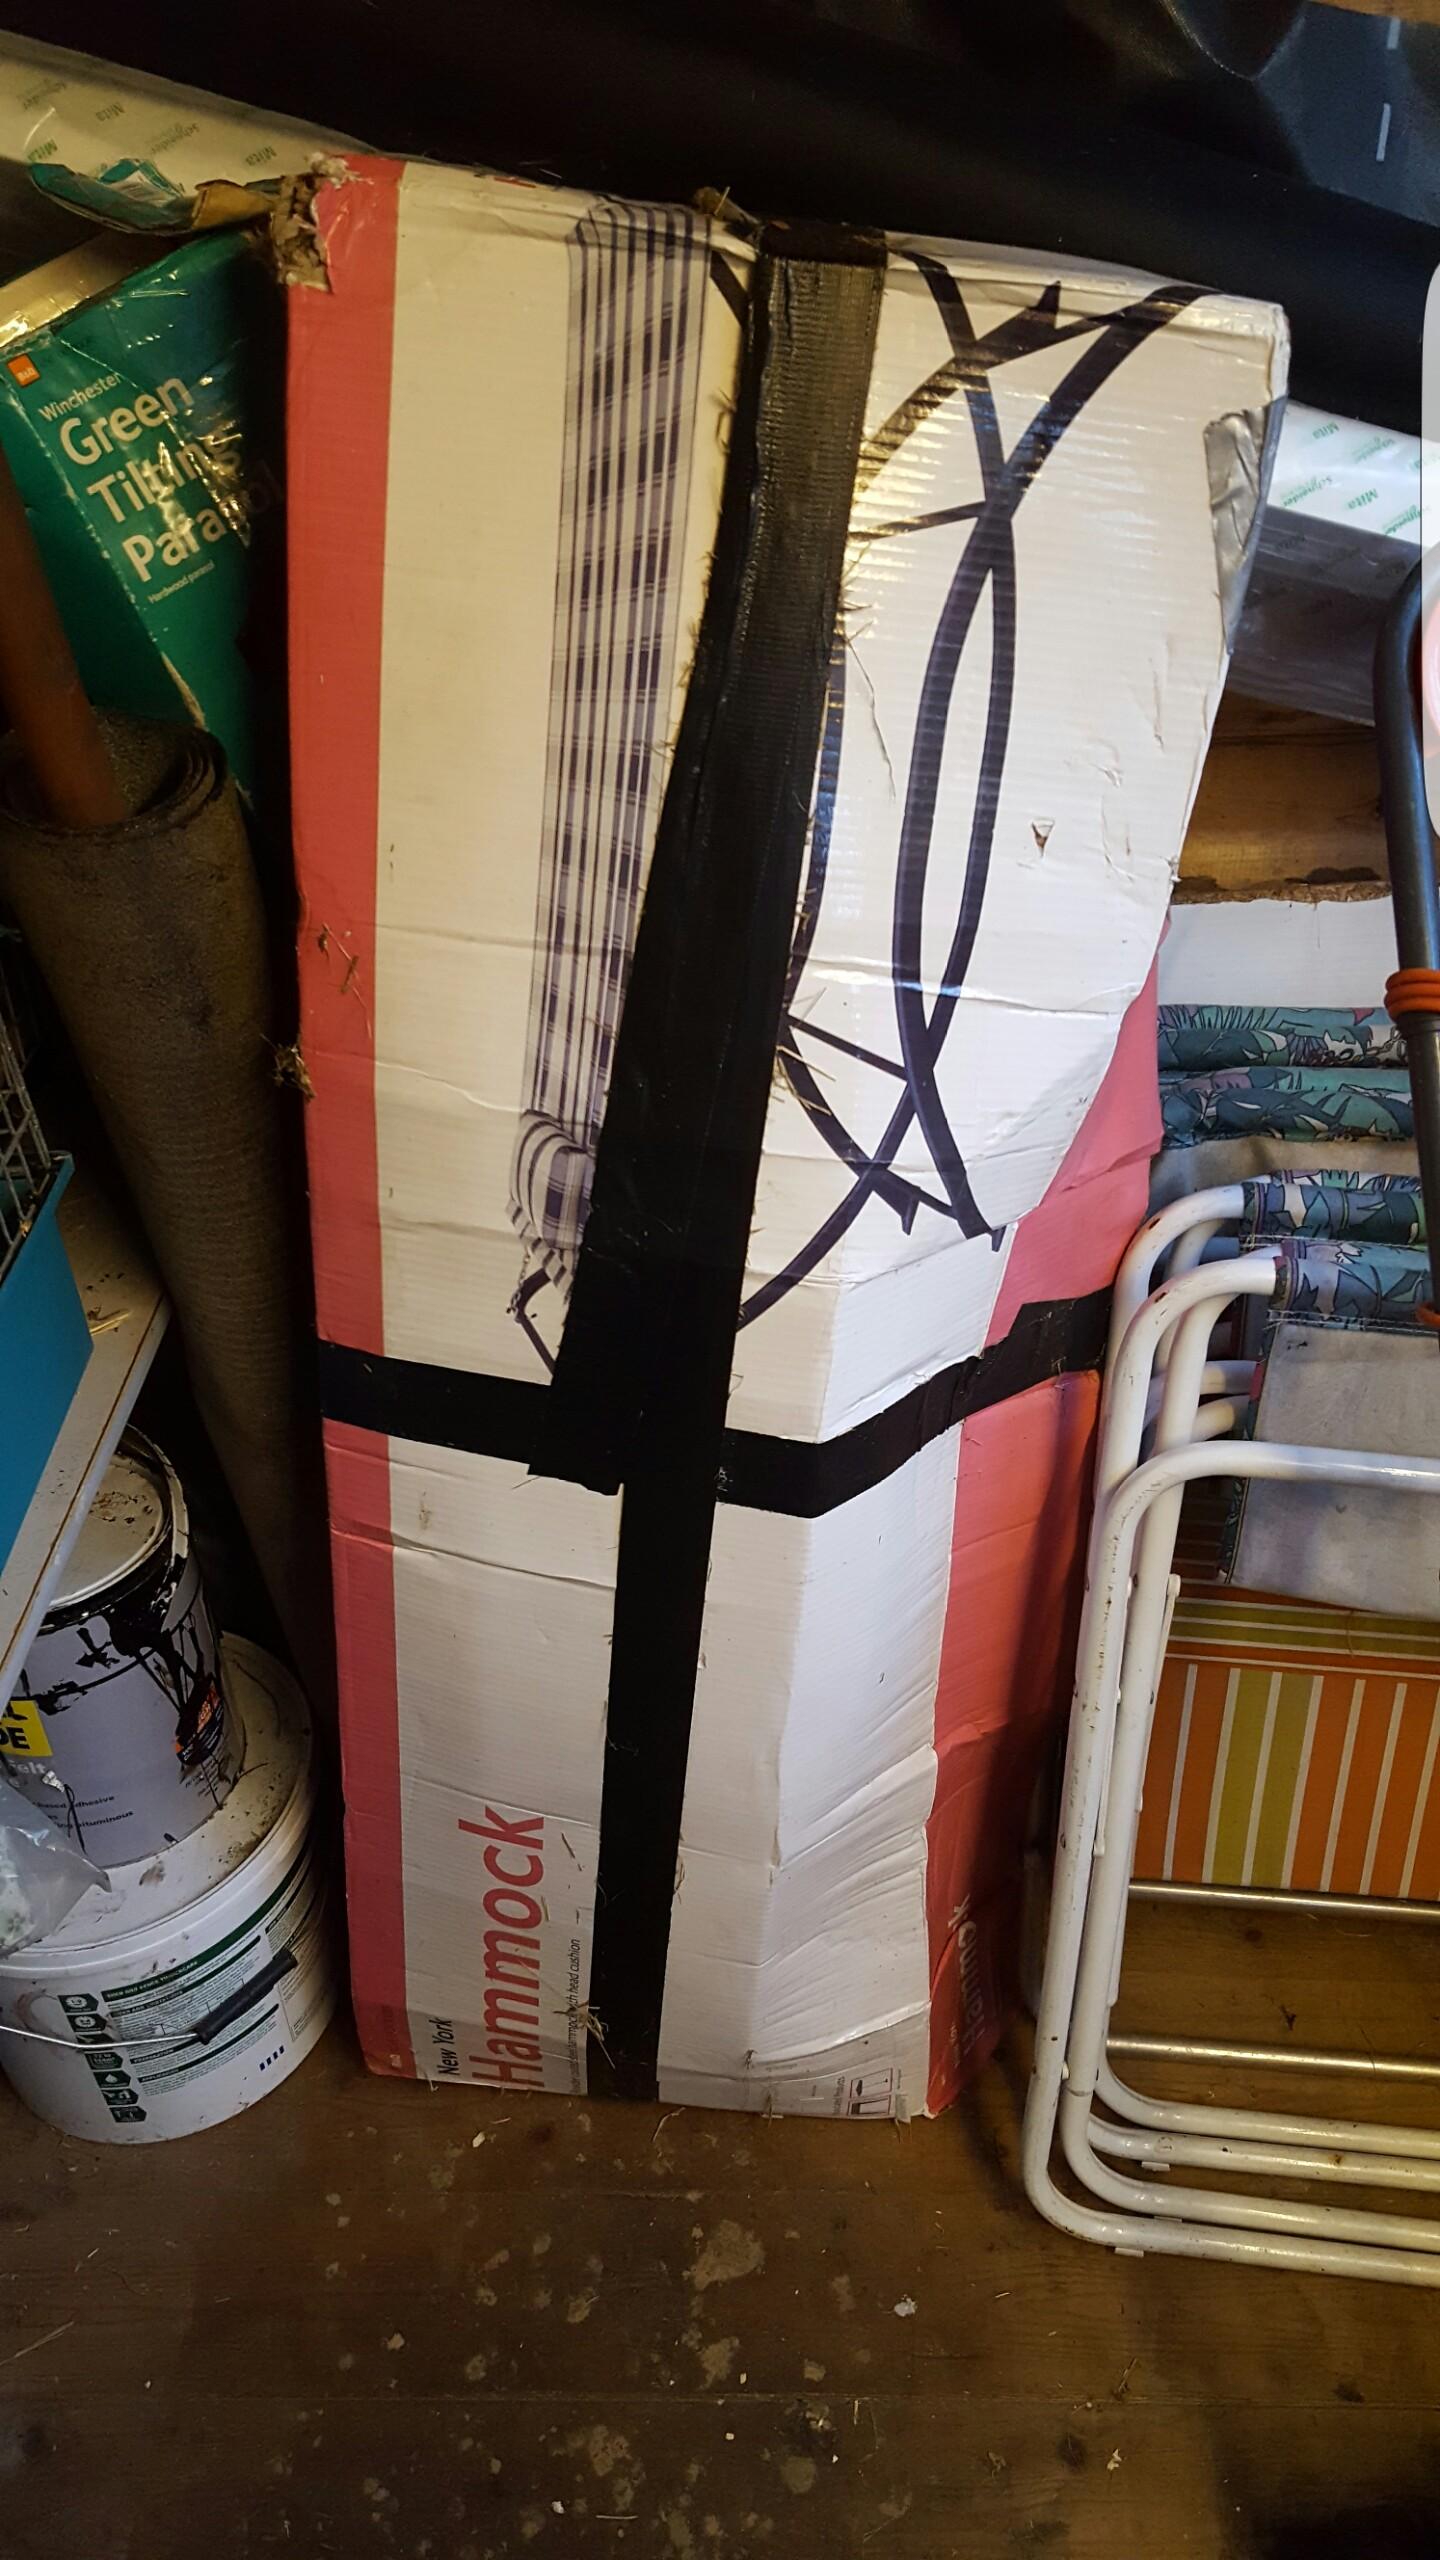 b u0026q outdoor new york hammock b u0026q outdoor new york hammock for sale in nottingham      rh   preloved co uk